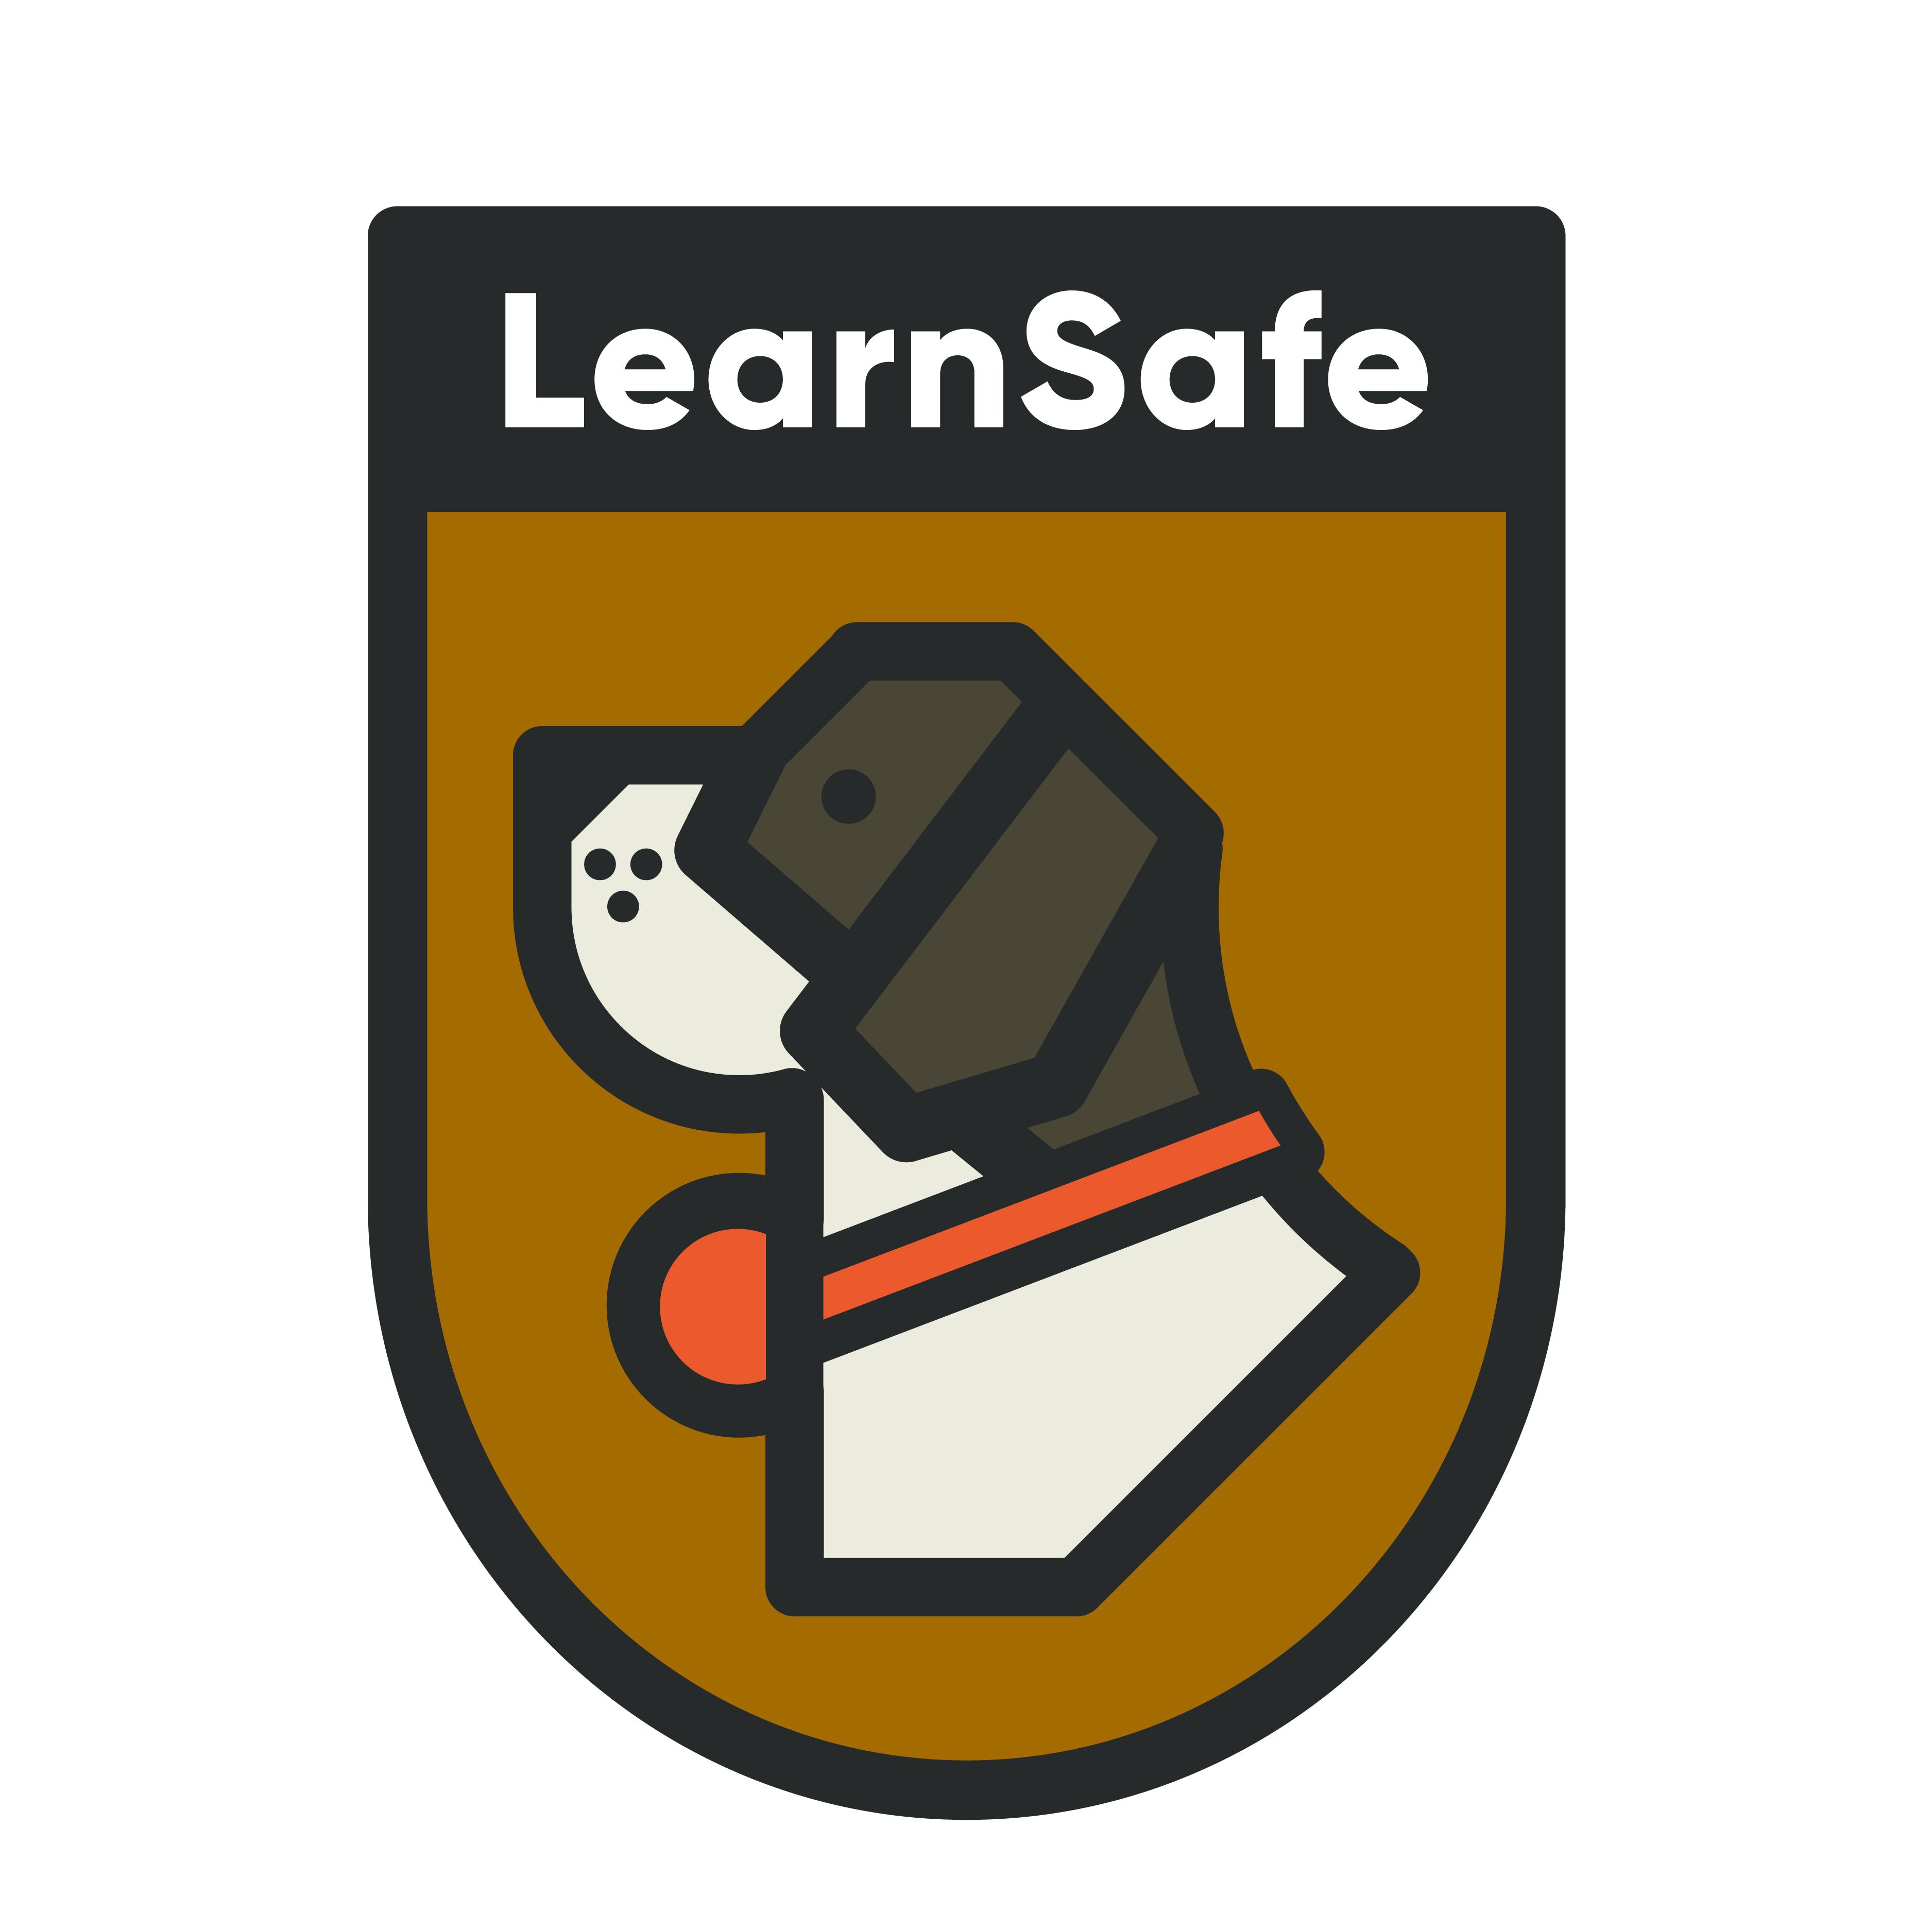 Learnsafe logo design by logo designer inkstache